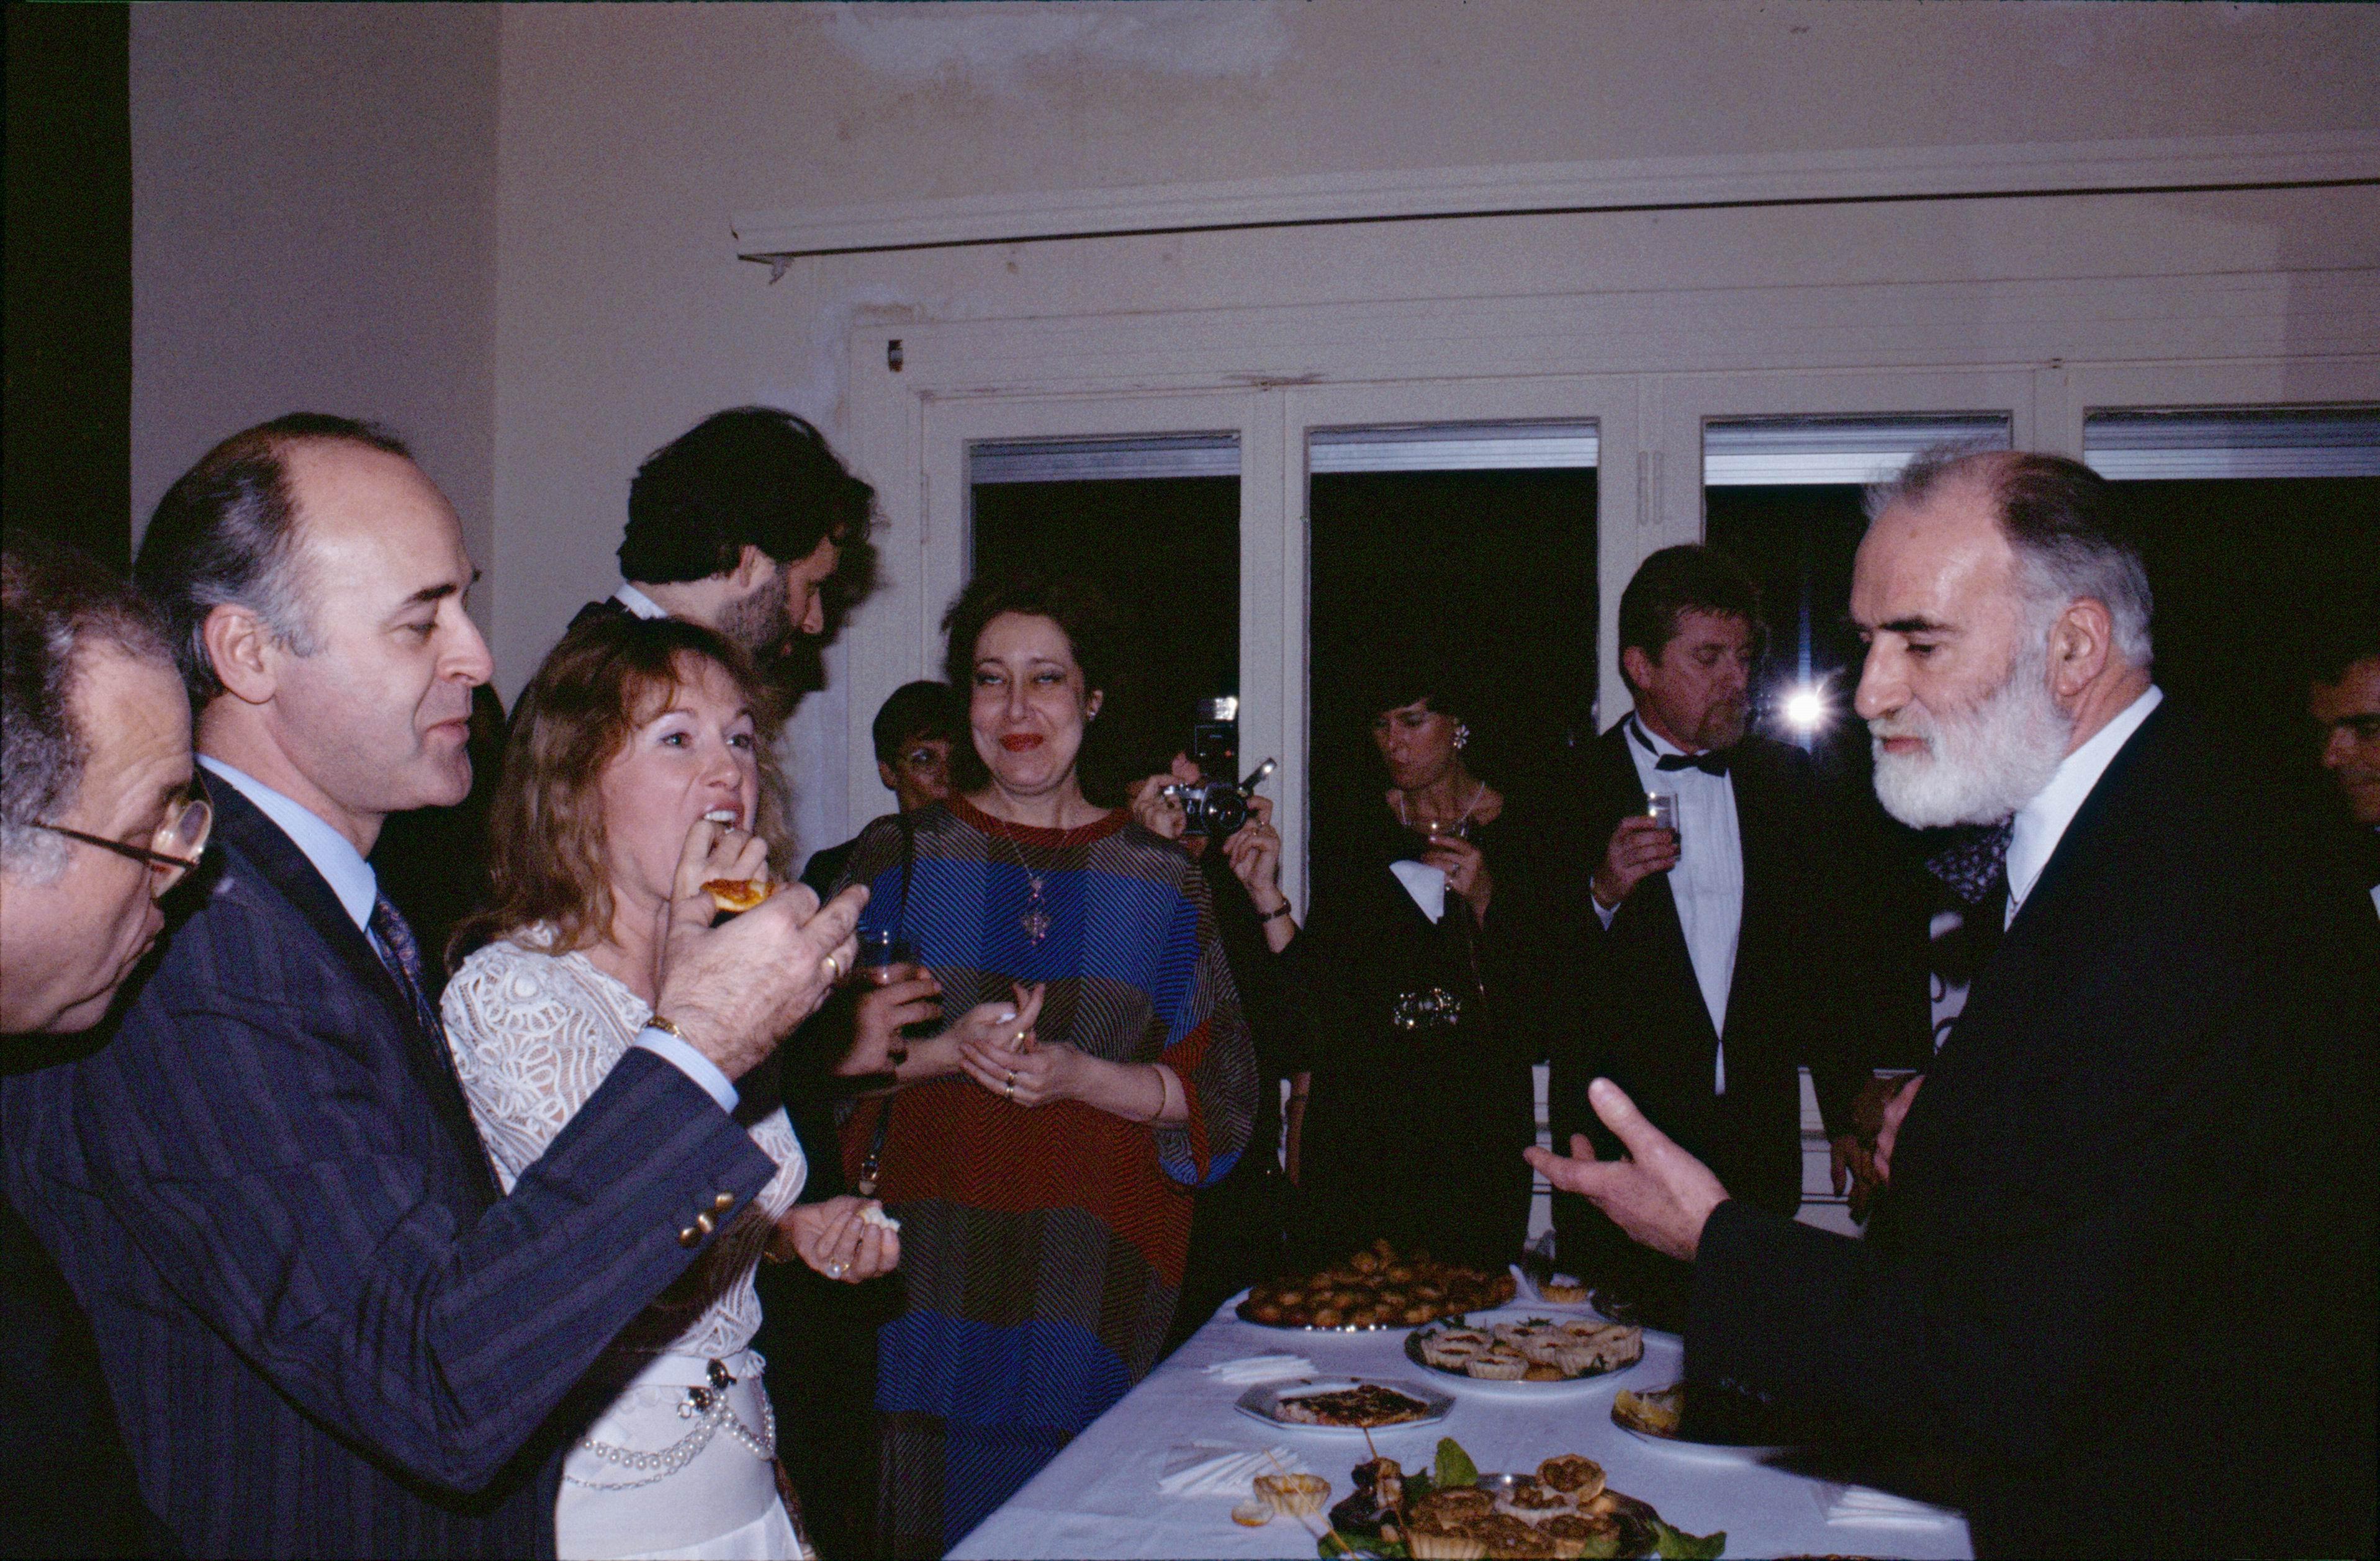 1986_12 (11) JAFFA Ambassade de France